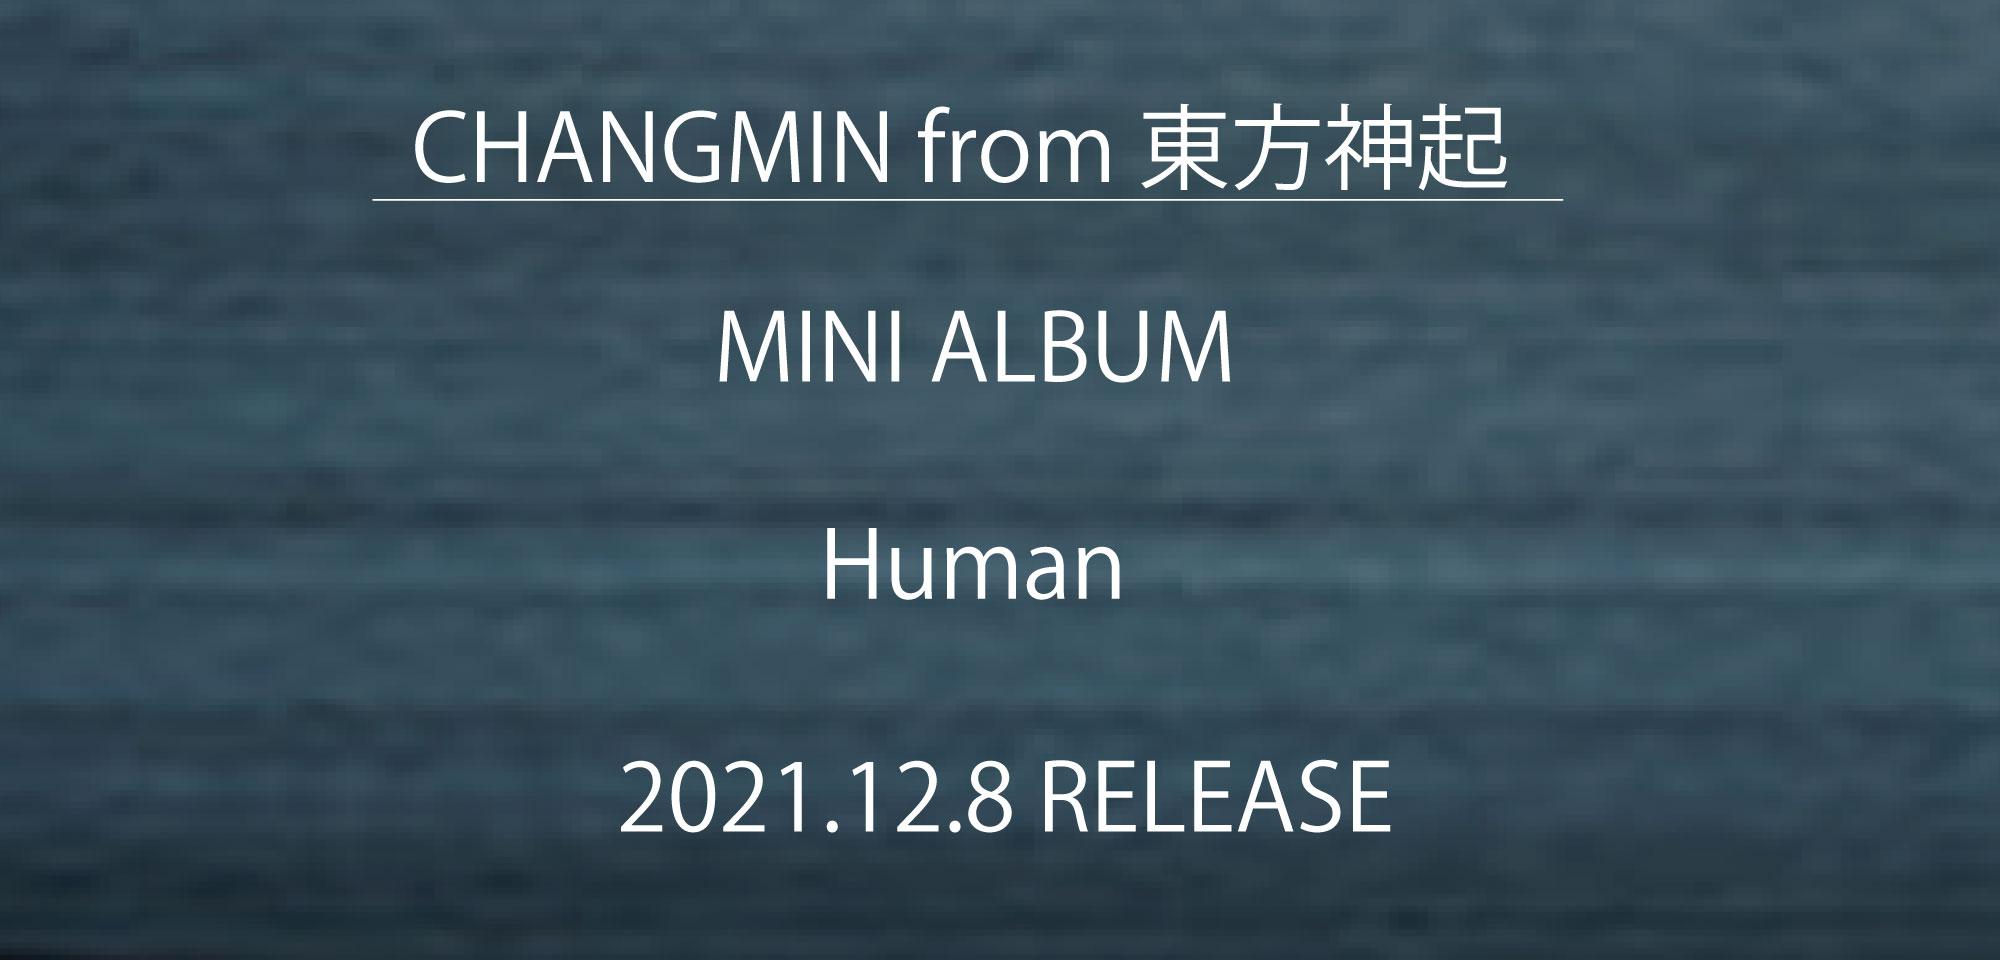 MNI ALBUM HUMAN